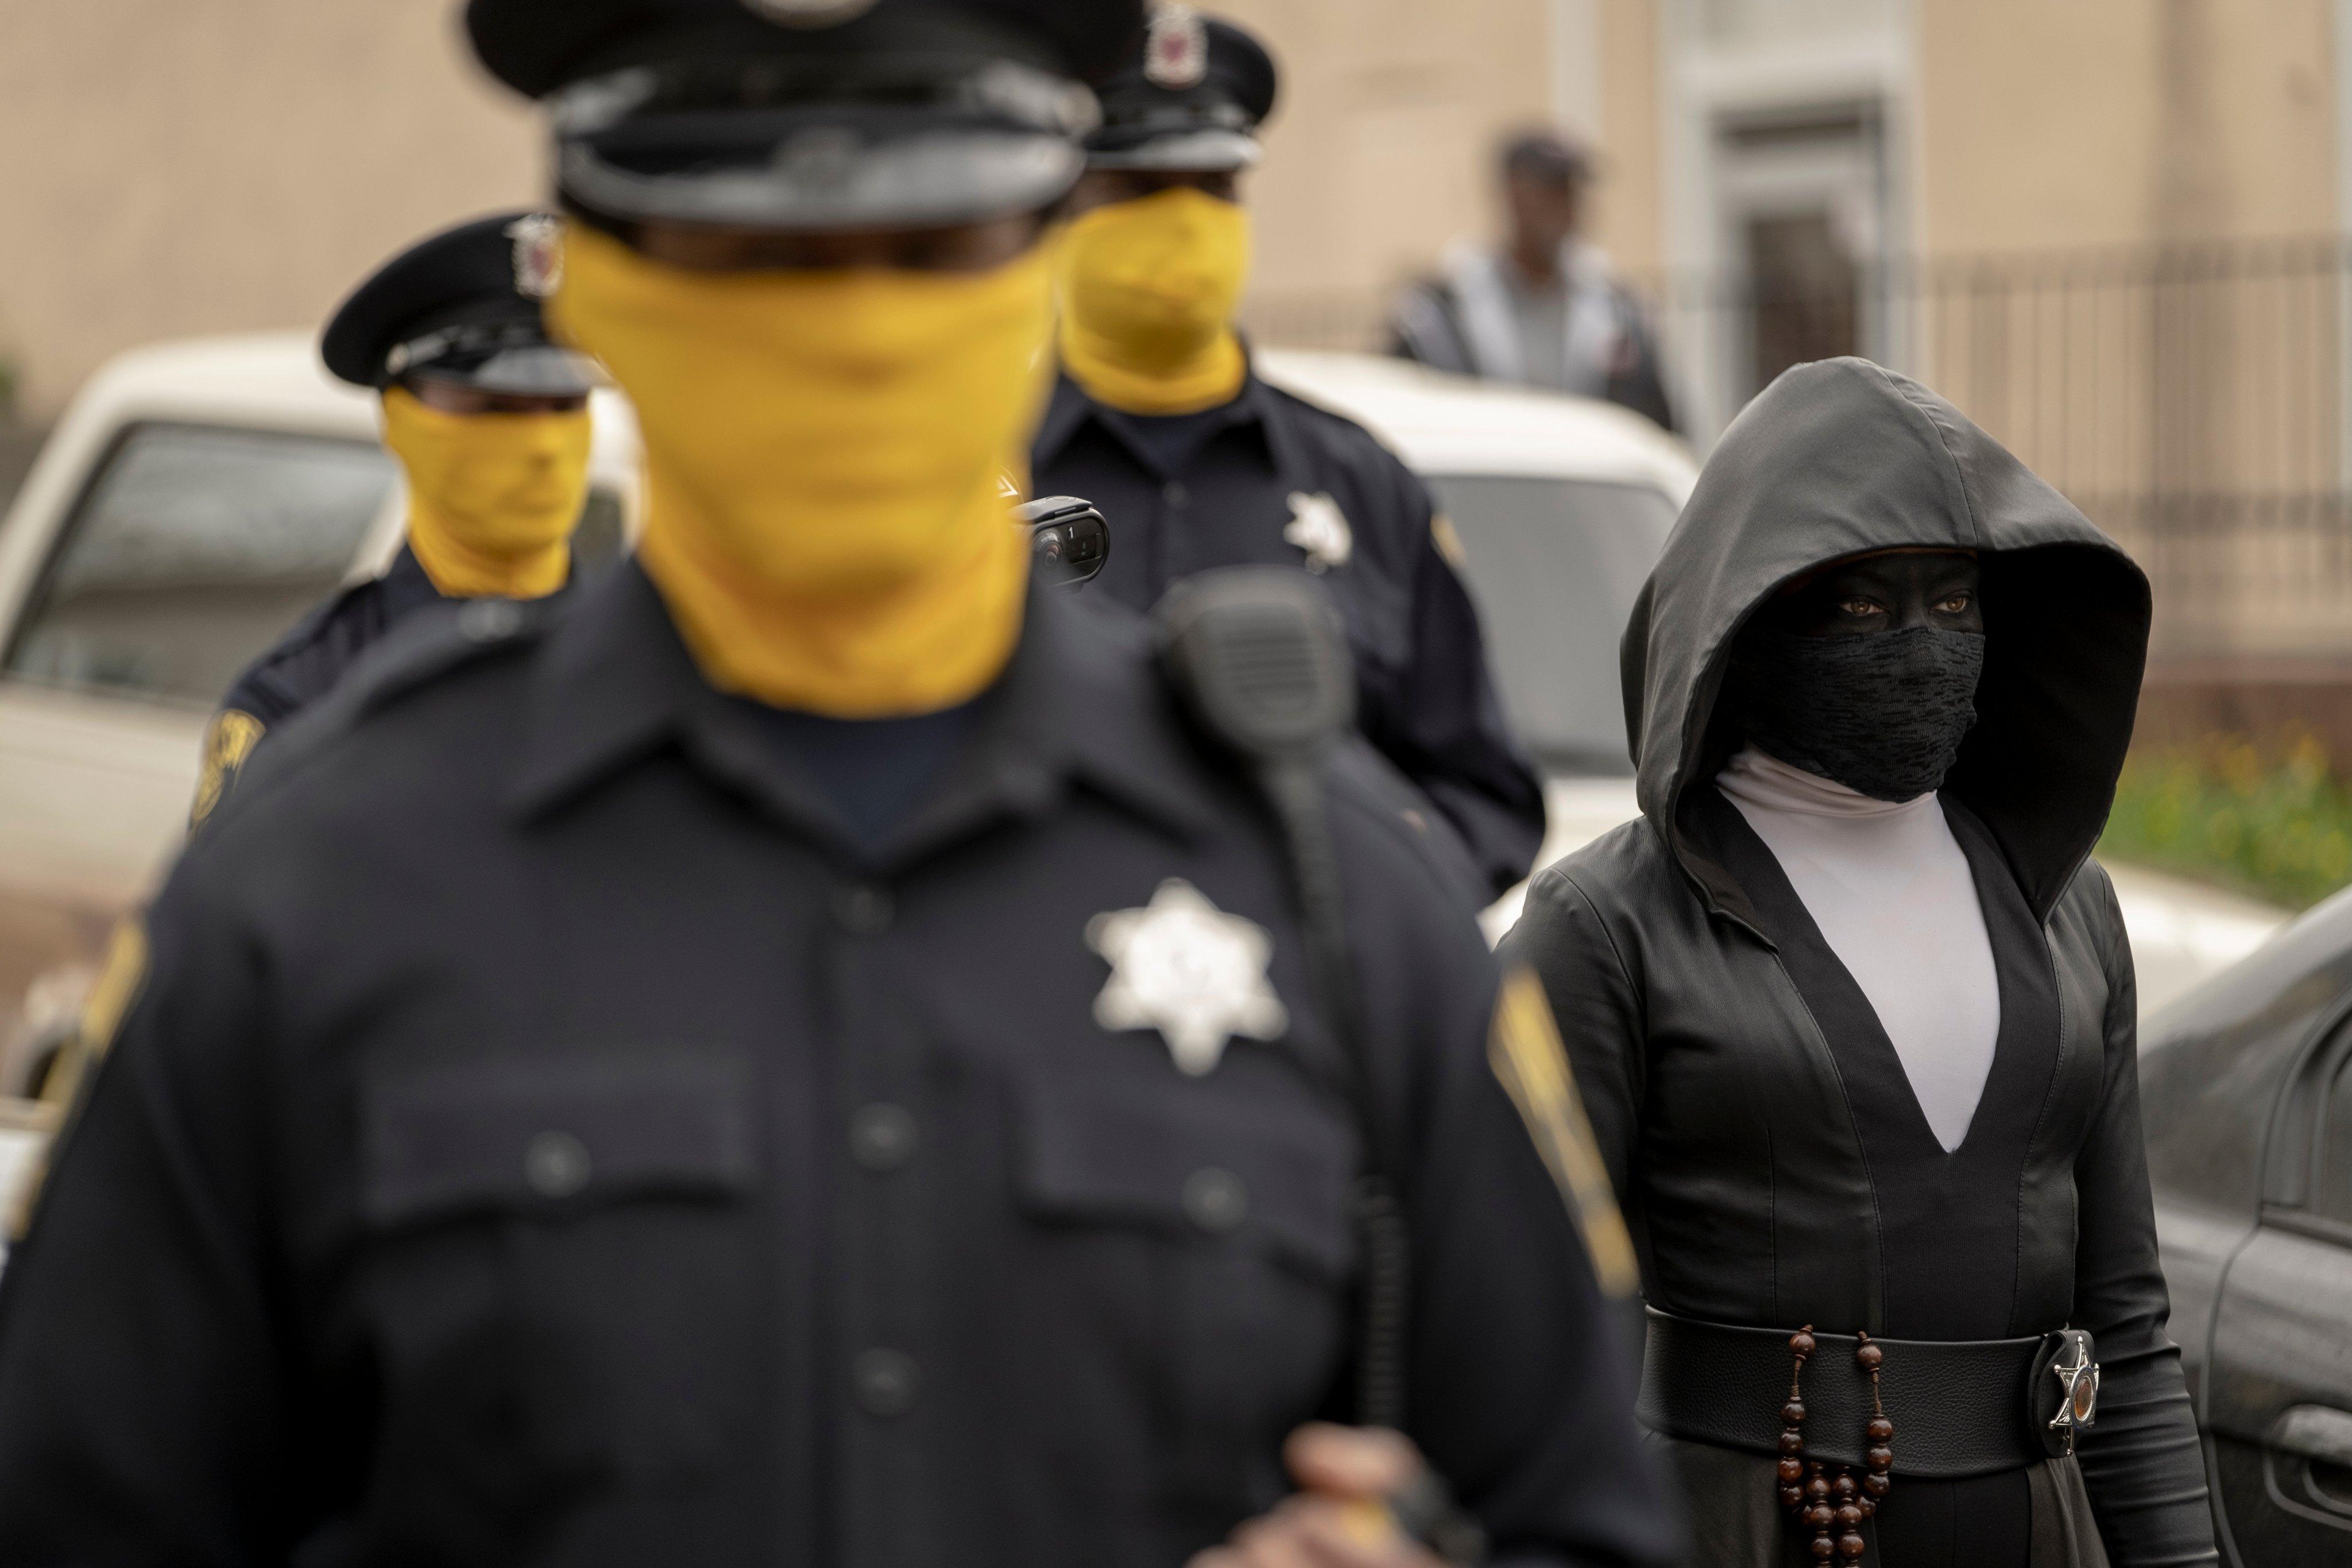 Watchmen Episode 2, HBO